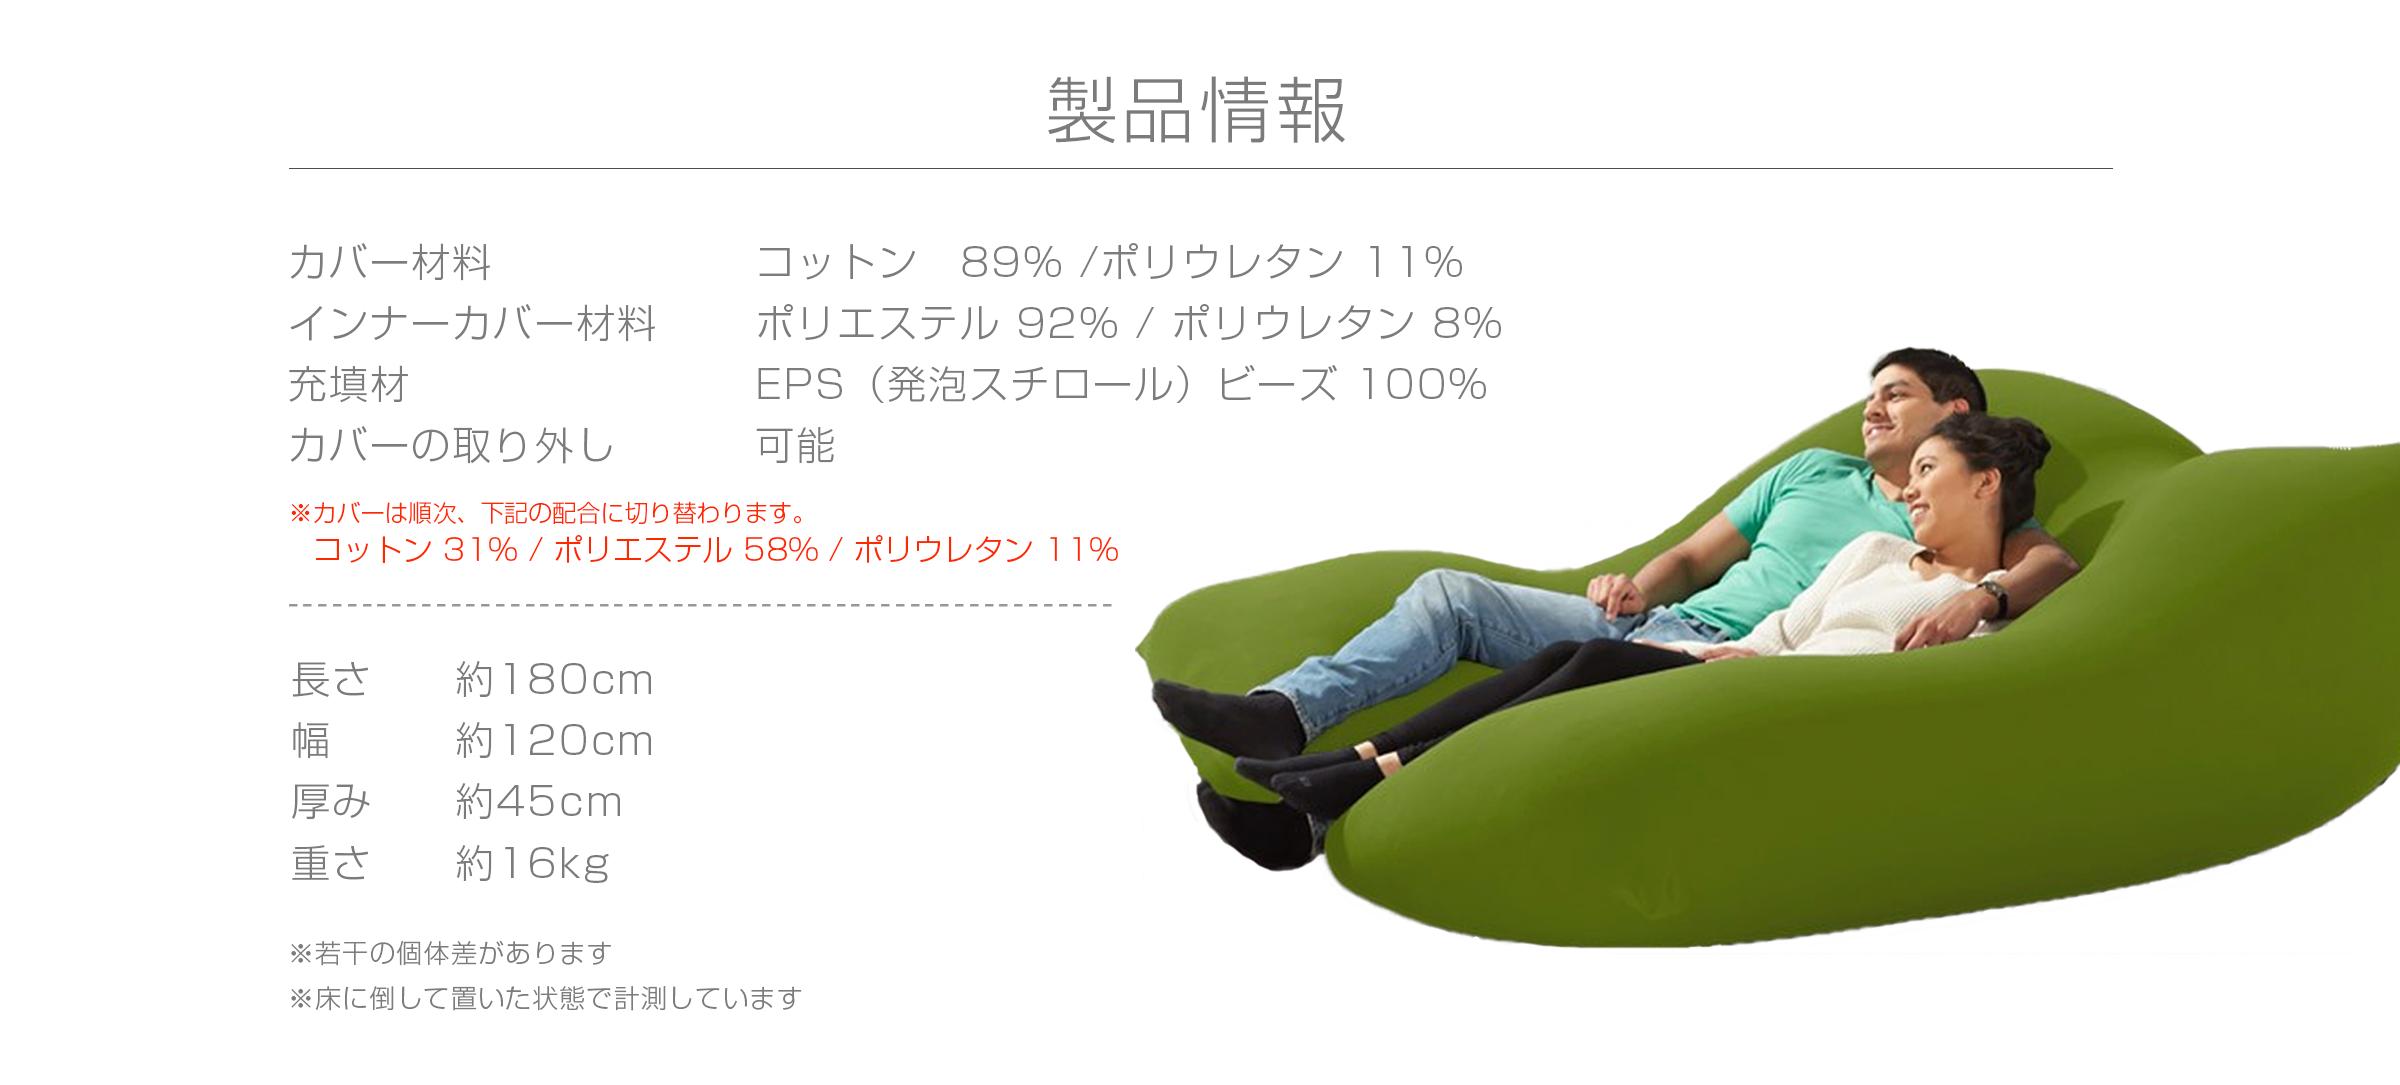 Yogibo Double(ヨギボー・ダブル)製品情報